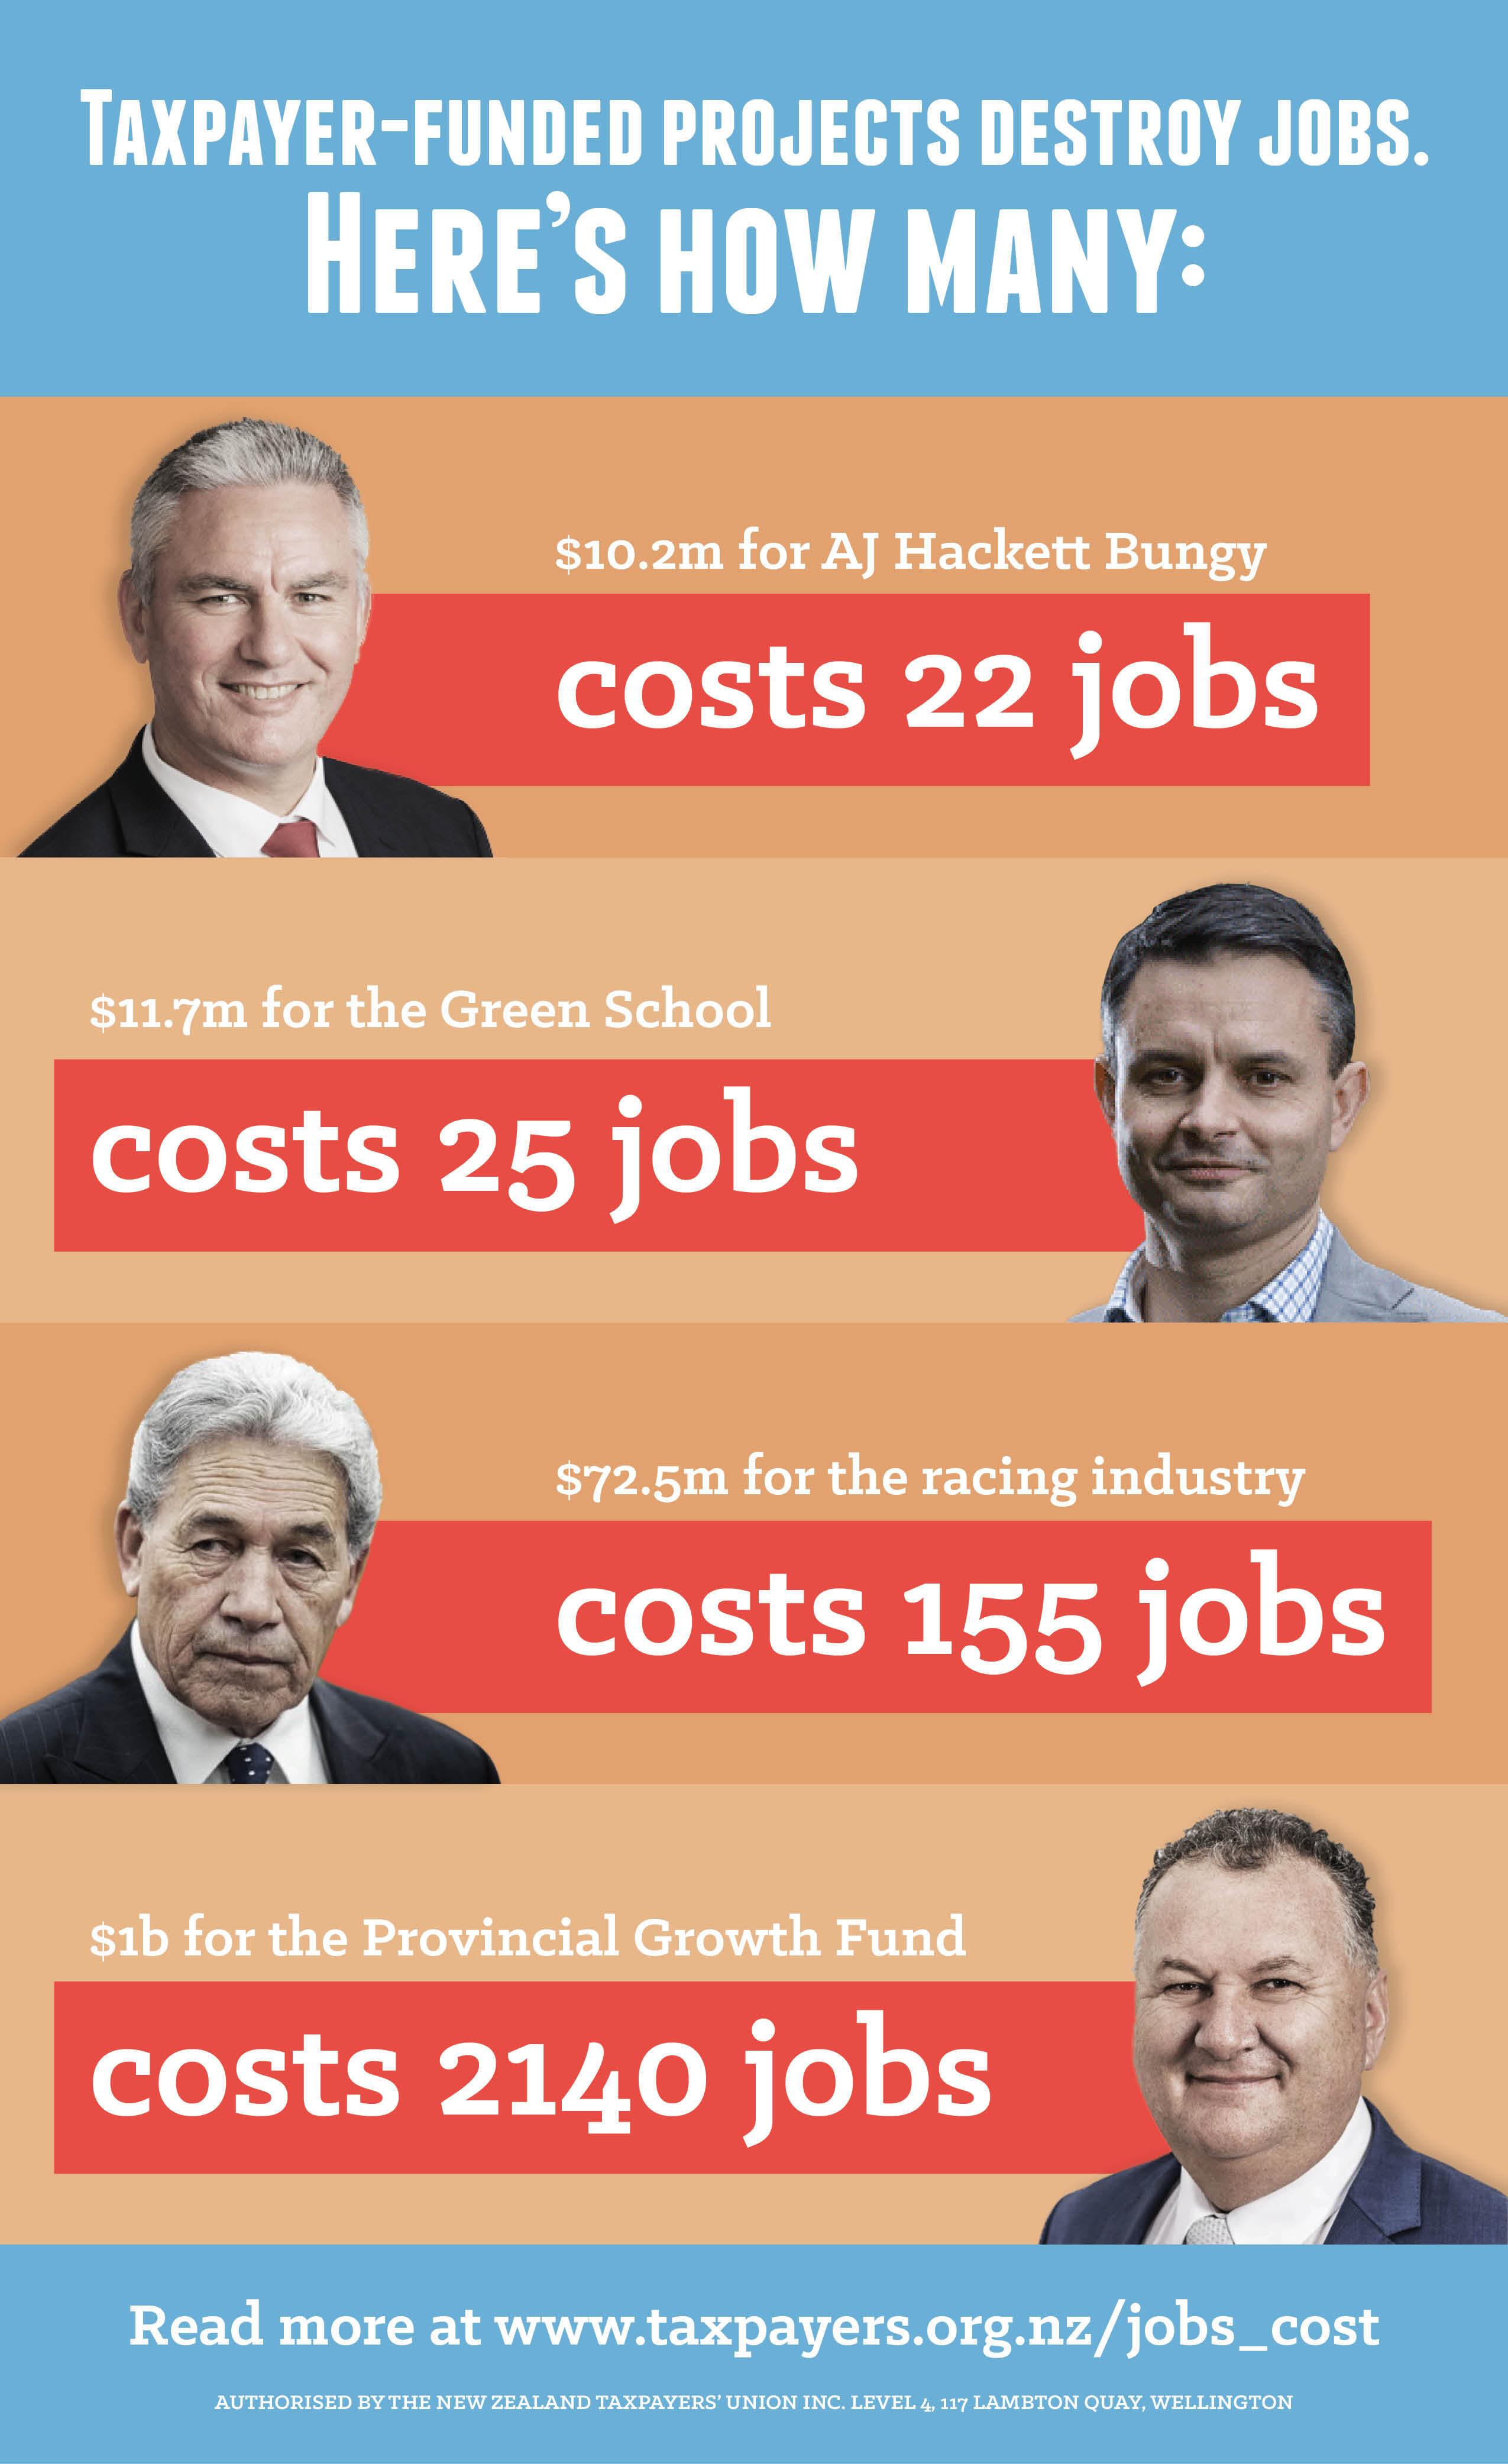 Jobs cost image